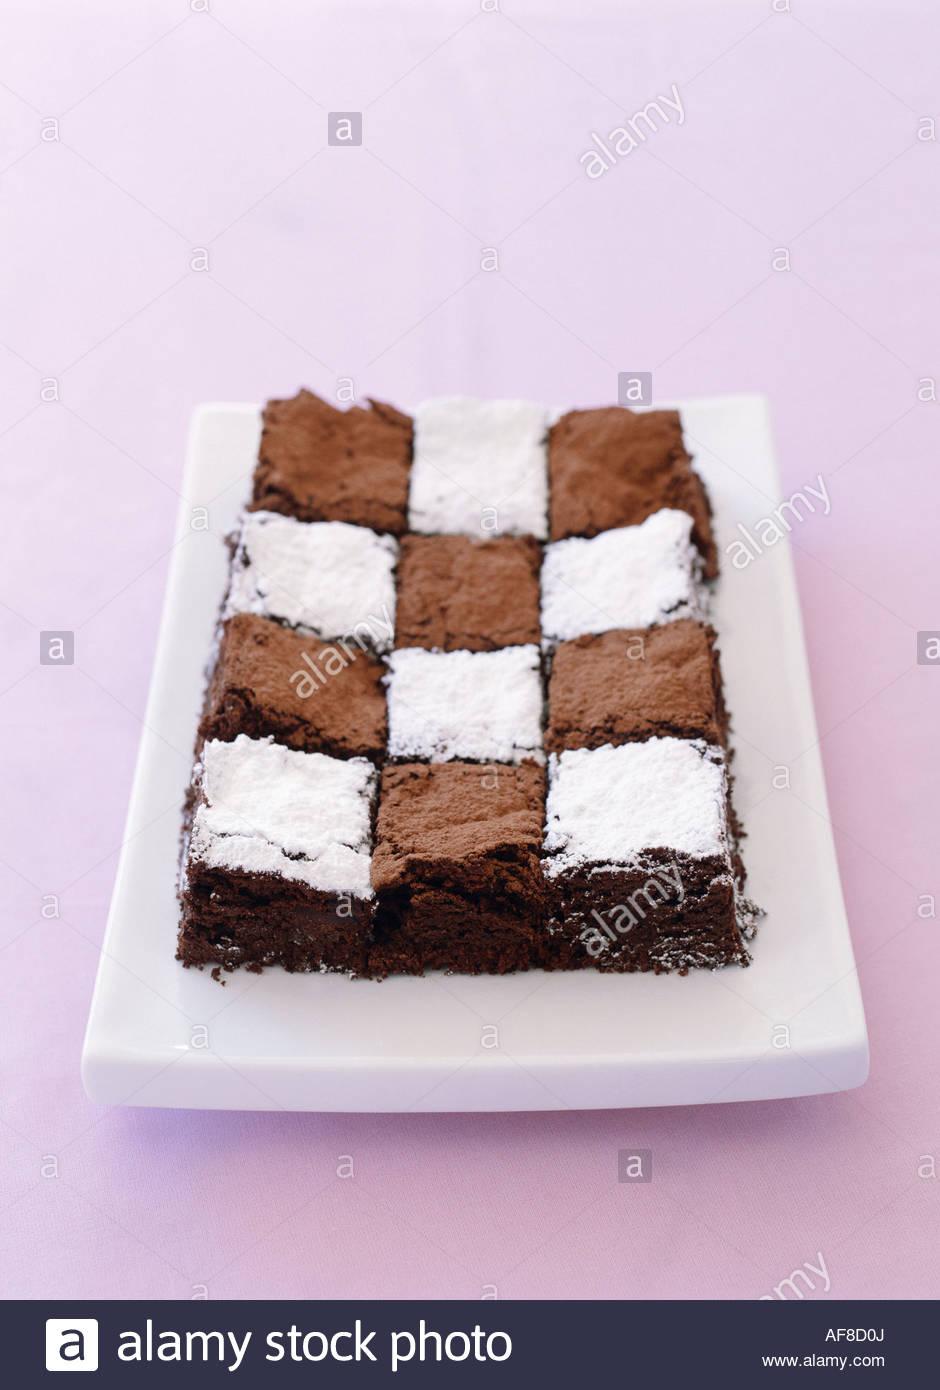 dark sponge cake with chess board design stock photo royalty free